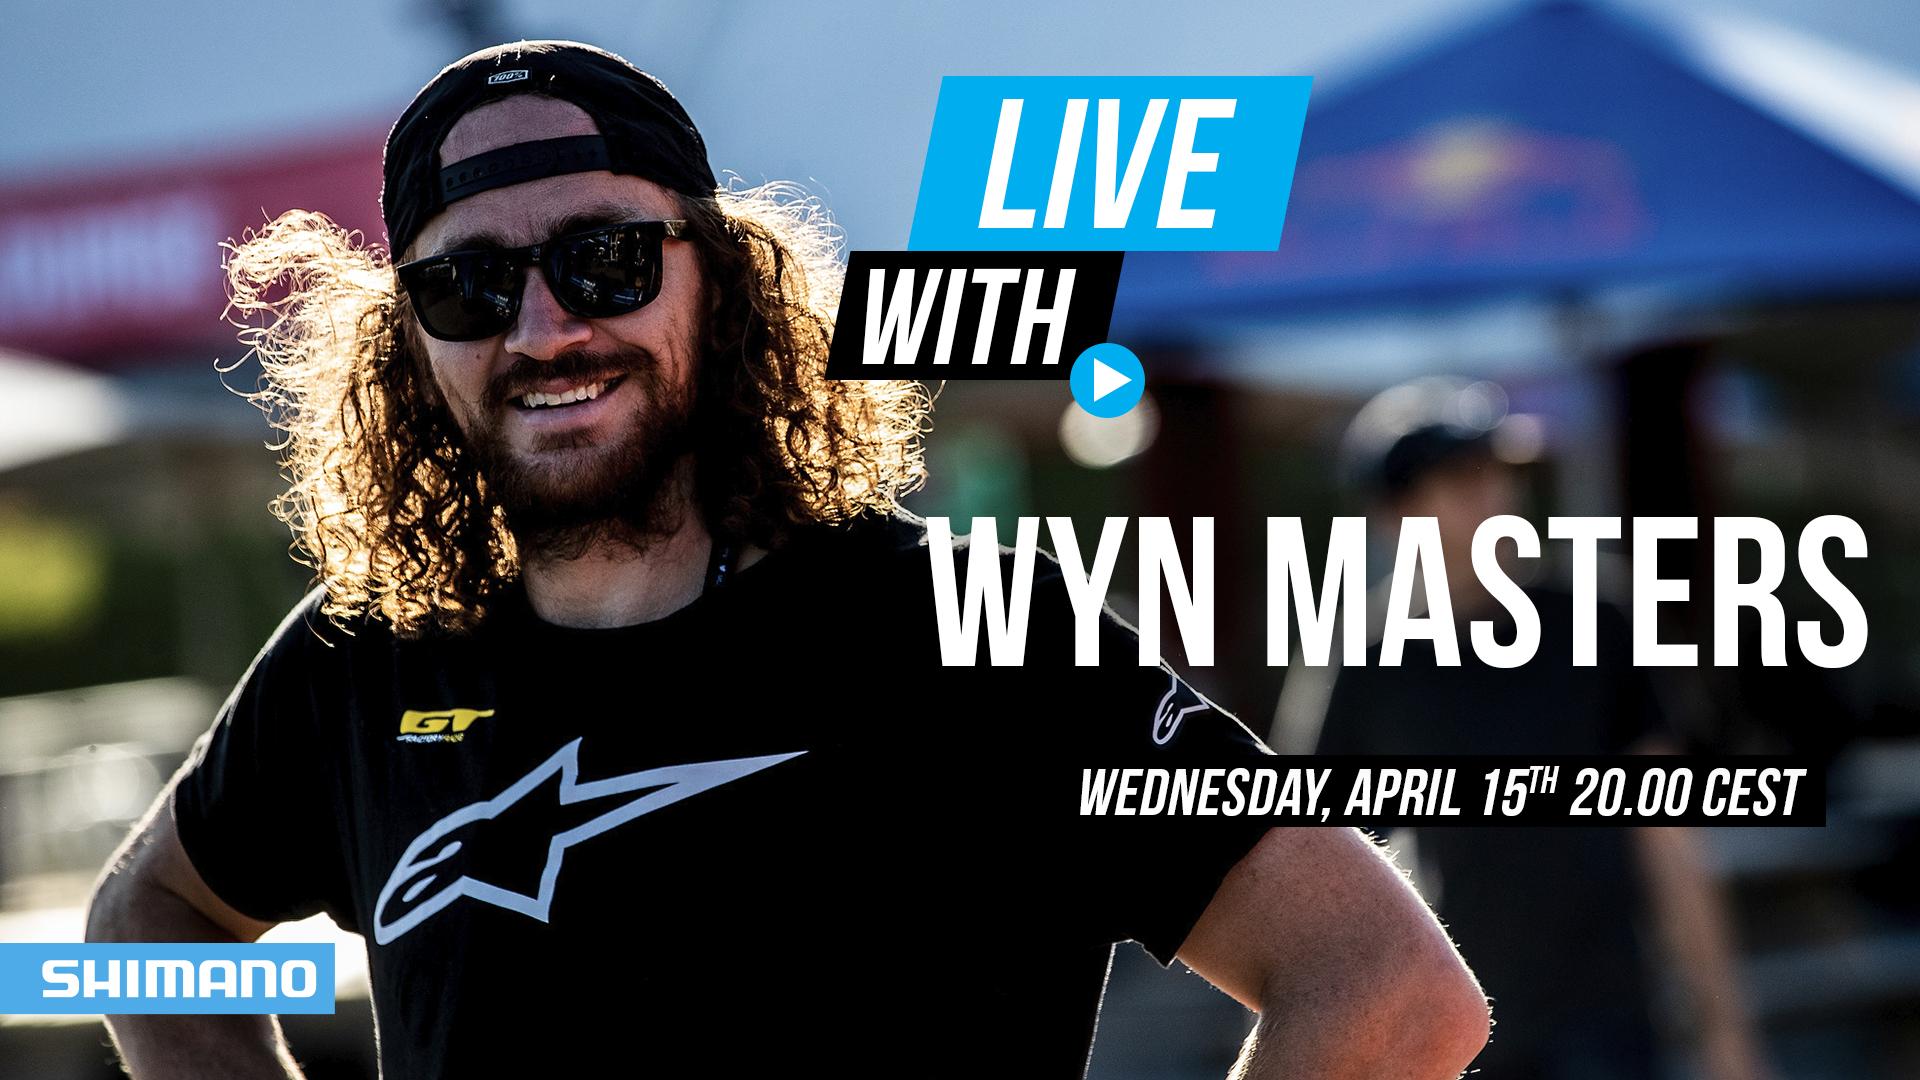 Wyn Masters - Shimano Facebook Live